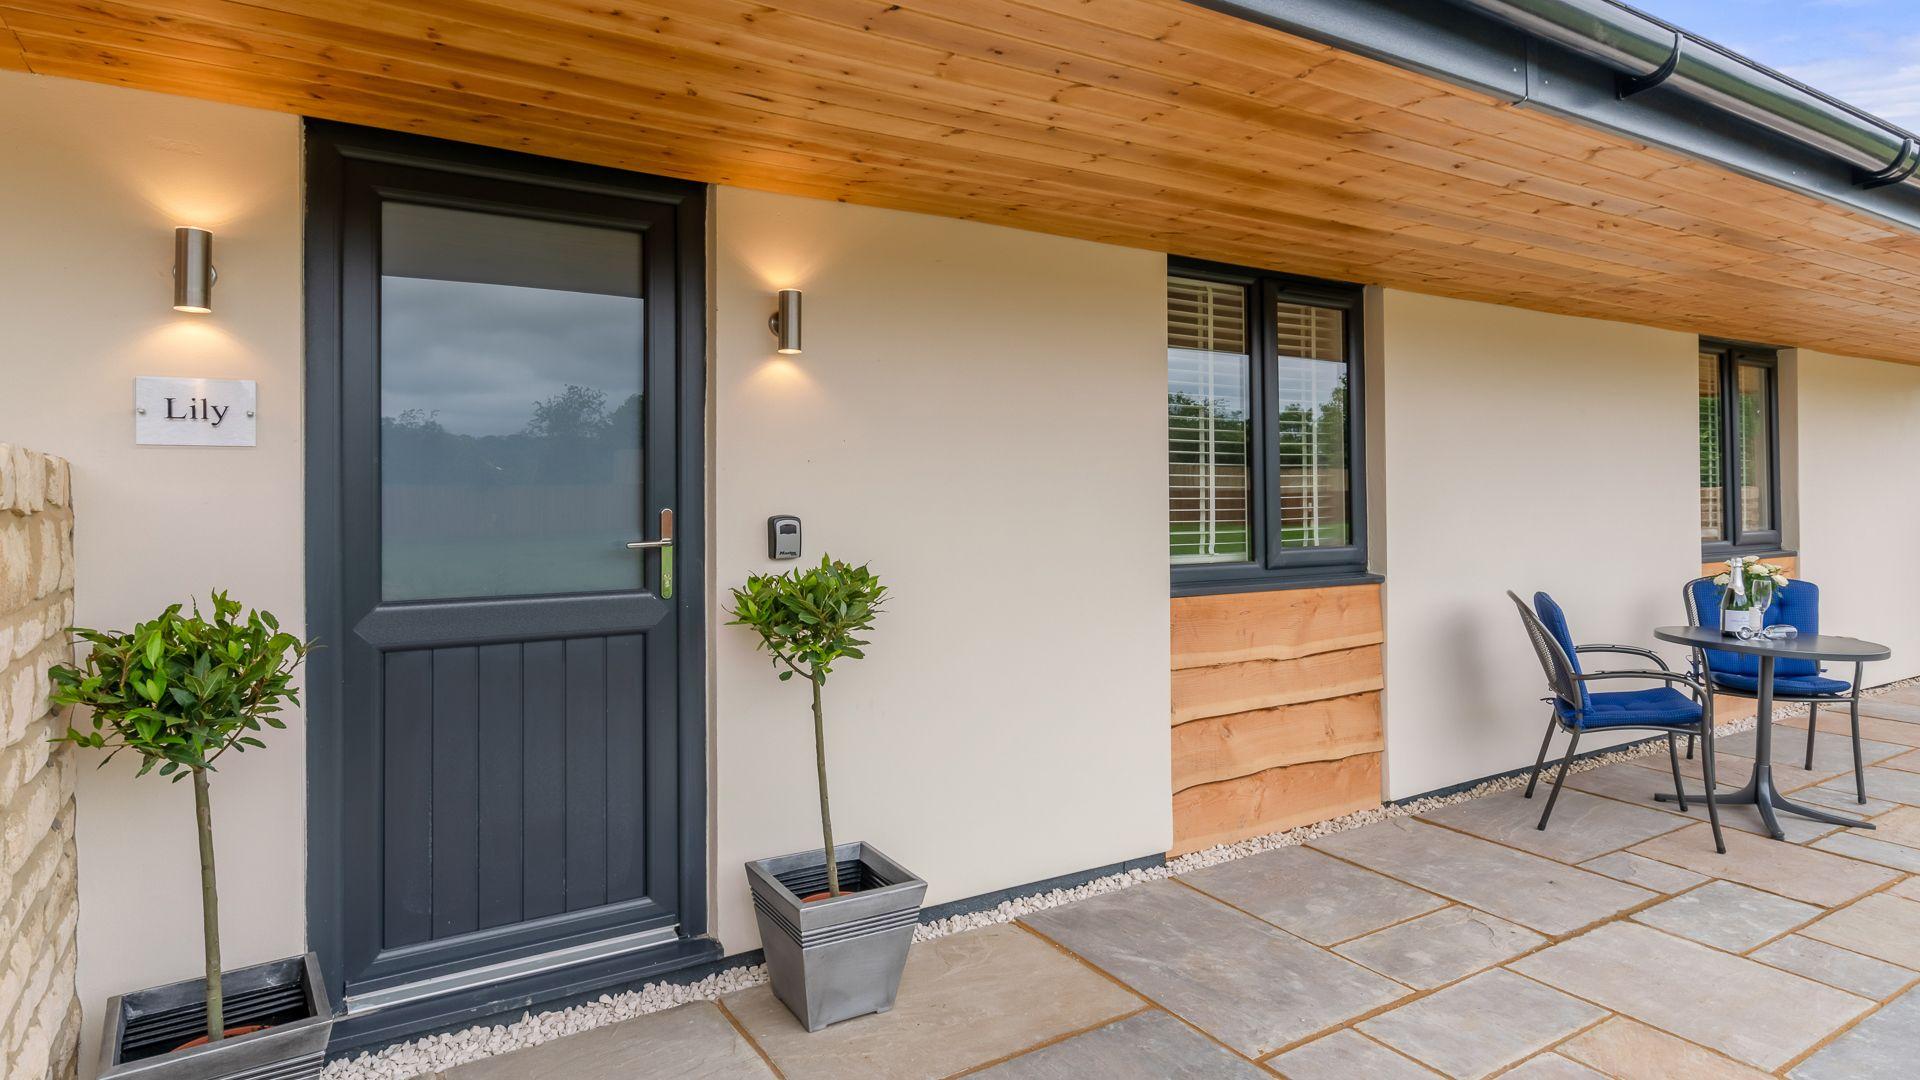 Exterior, Lily Barn at Laburnum Farm Estate, Bolthole Retreats